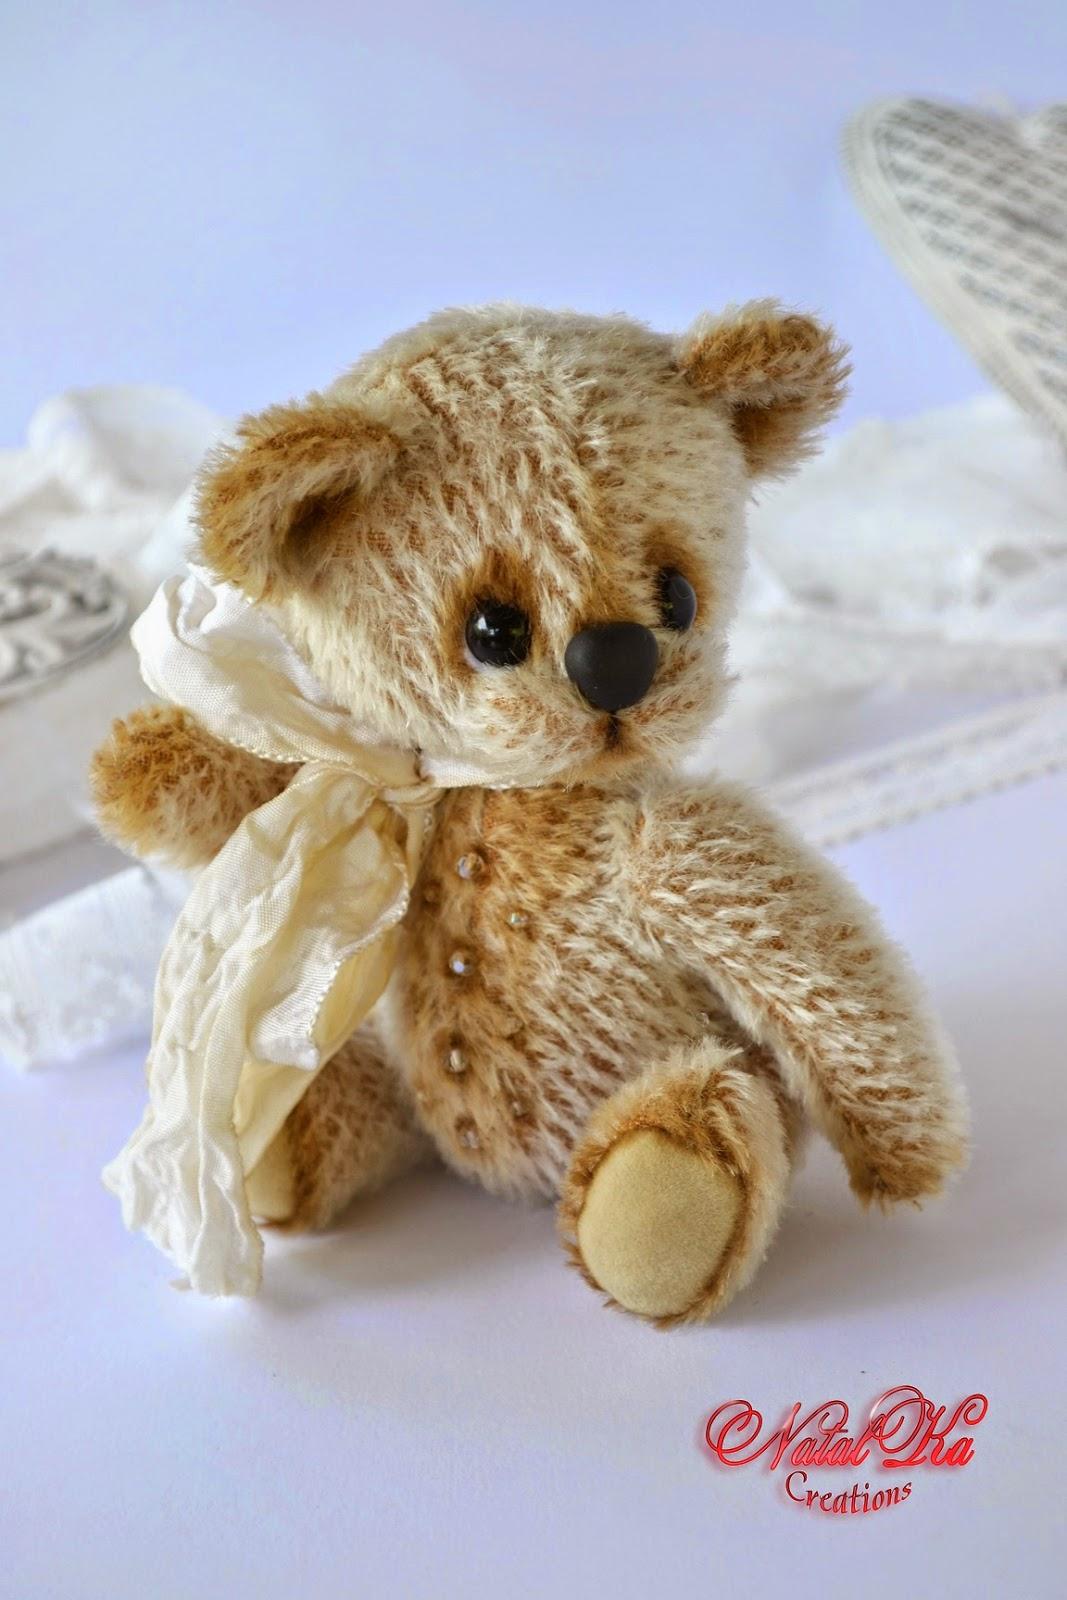 Künstlerbär Teddy handgemacht von NatalKa Creations. Artist teddy bear handmade by NatalKa Creations.